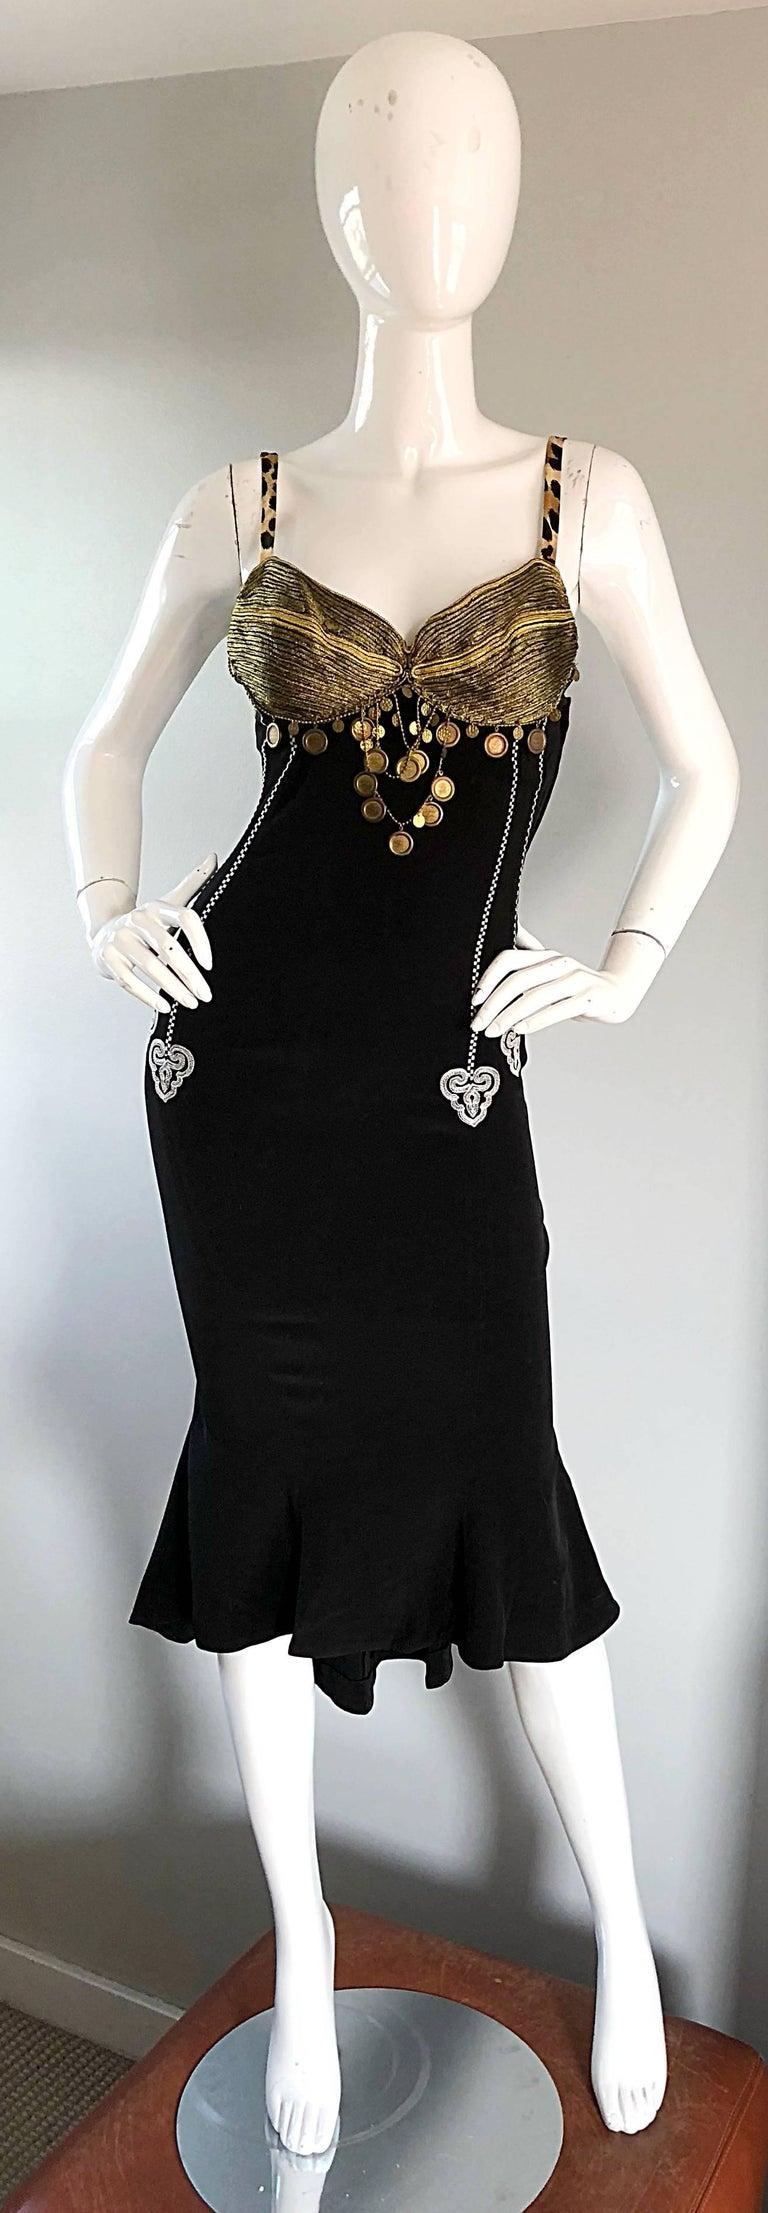 Women's 1980s Rifat Ozbek Sz 8 Black White Leopard Print Coin Embellished Mermaid Dress For Sale